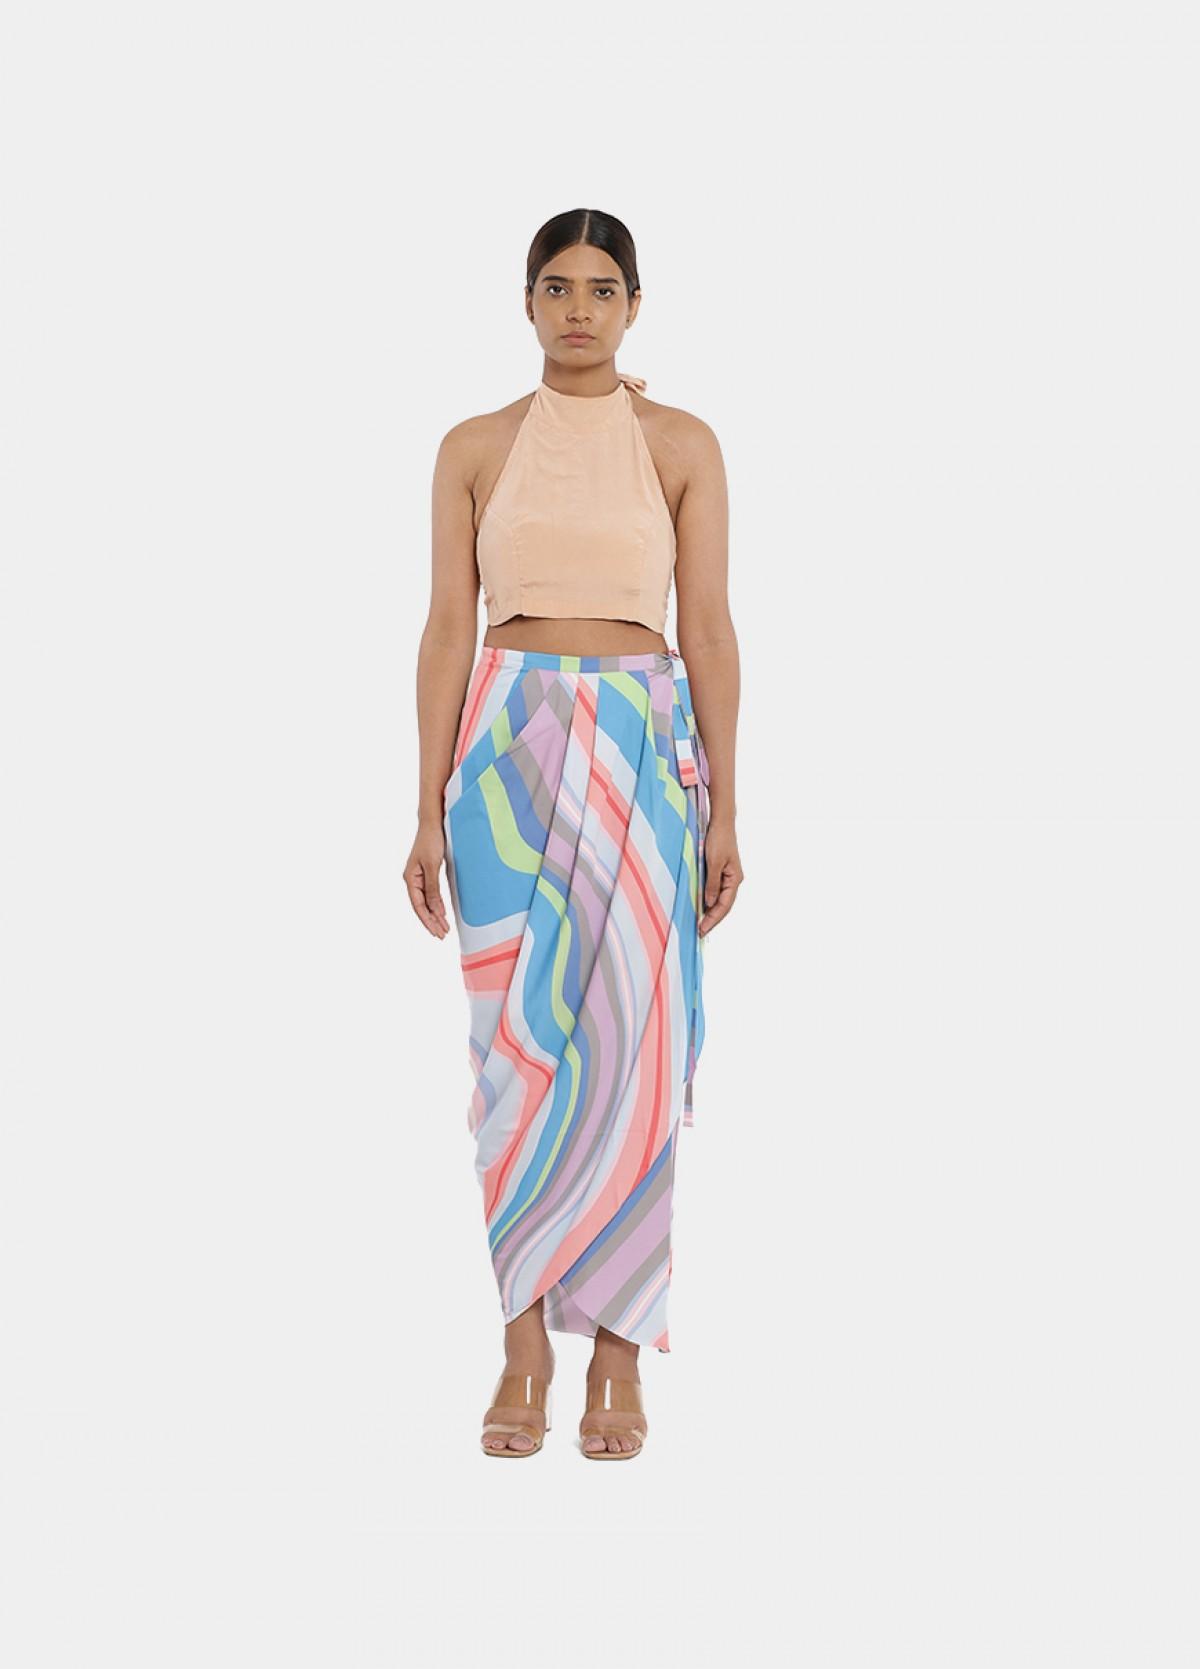 The Miley skirt